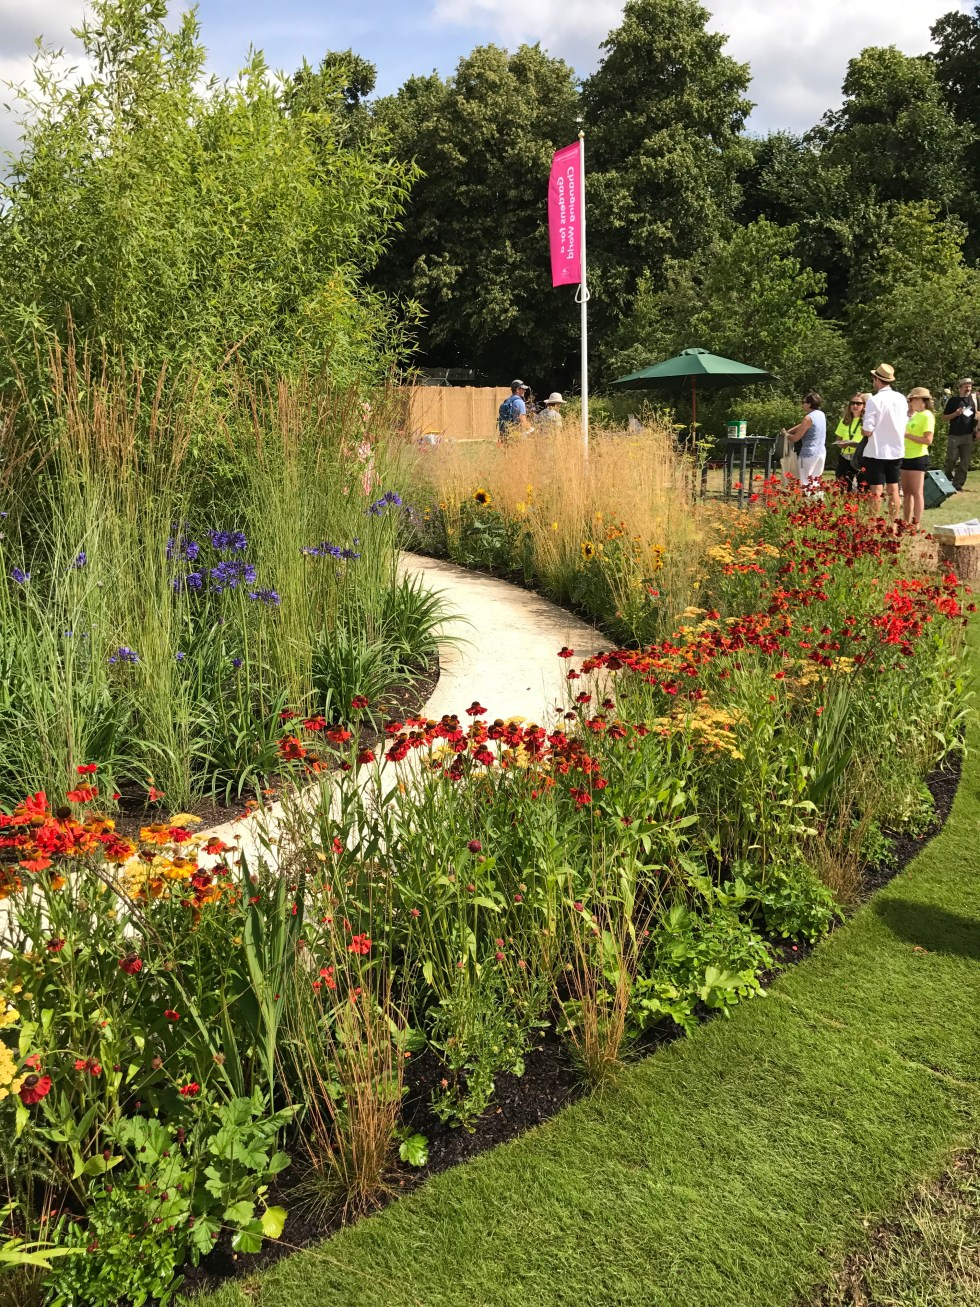 img 0040 Hampton court flower show, a brief summary